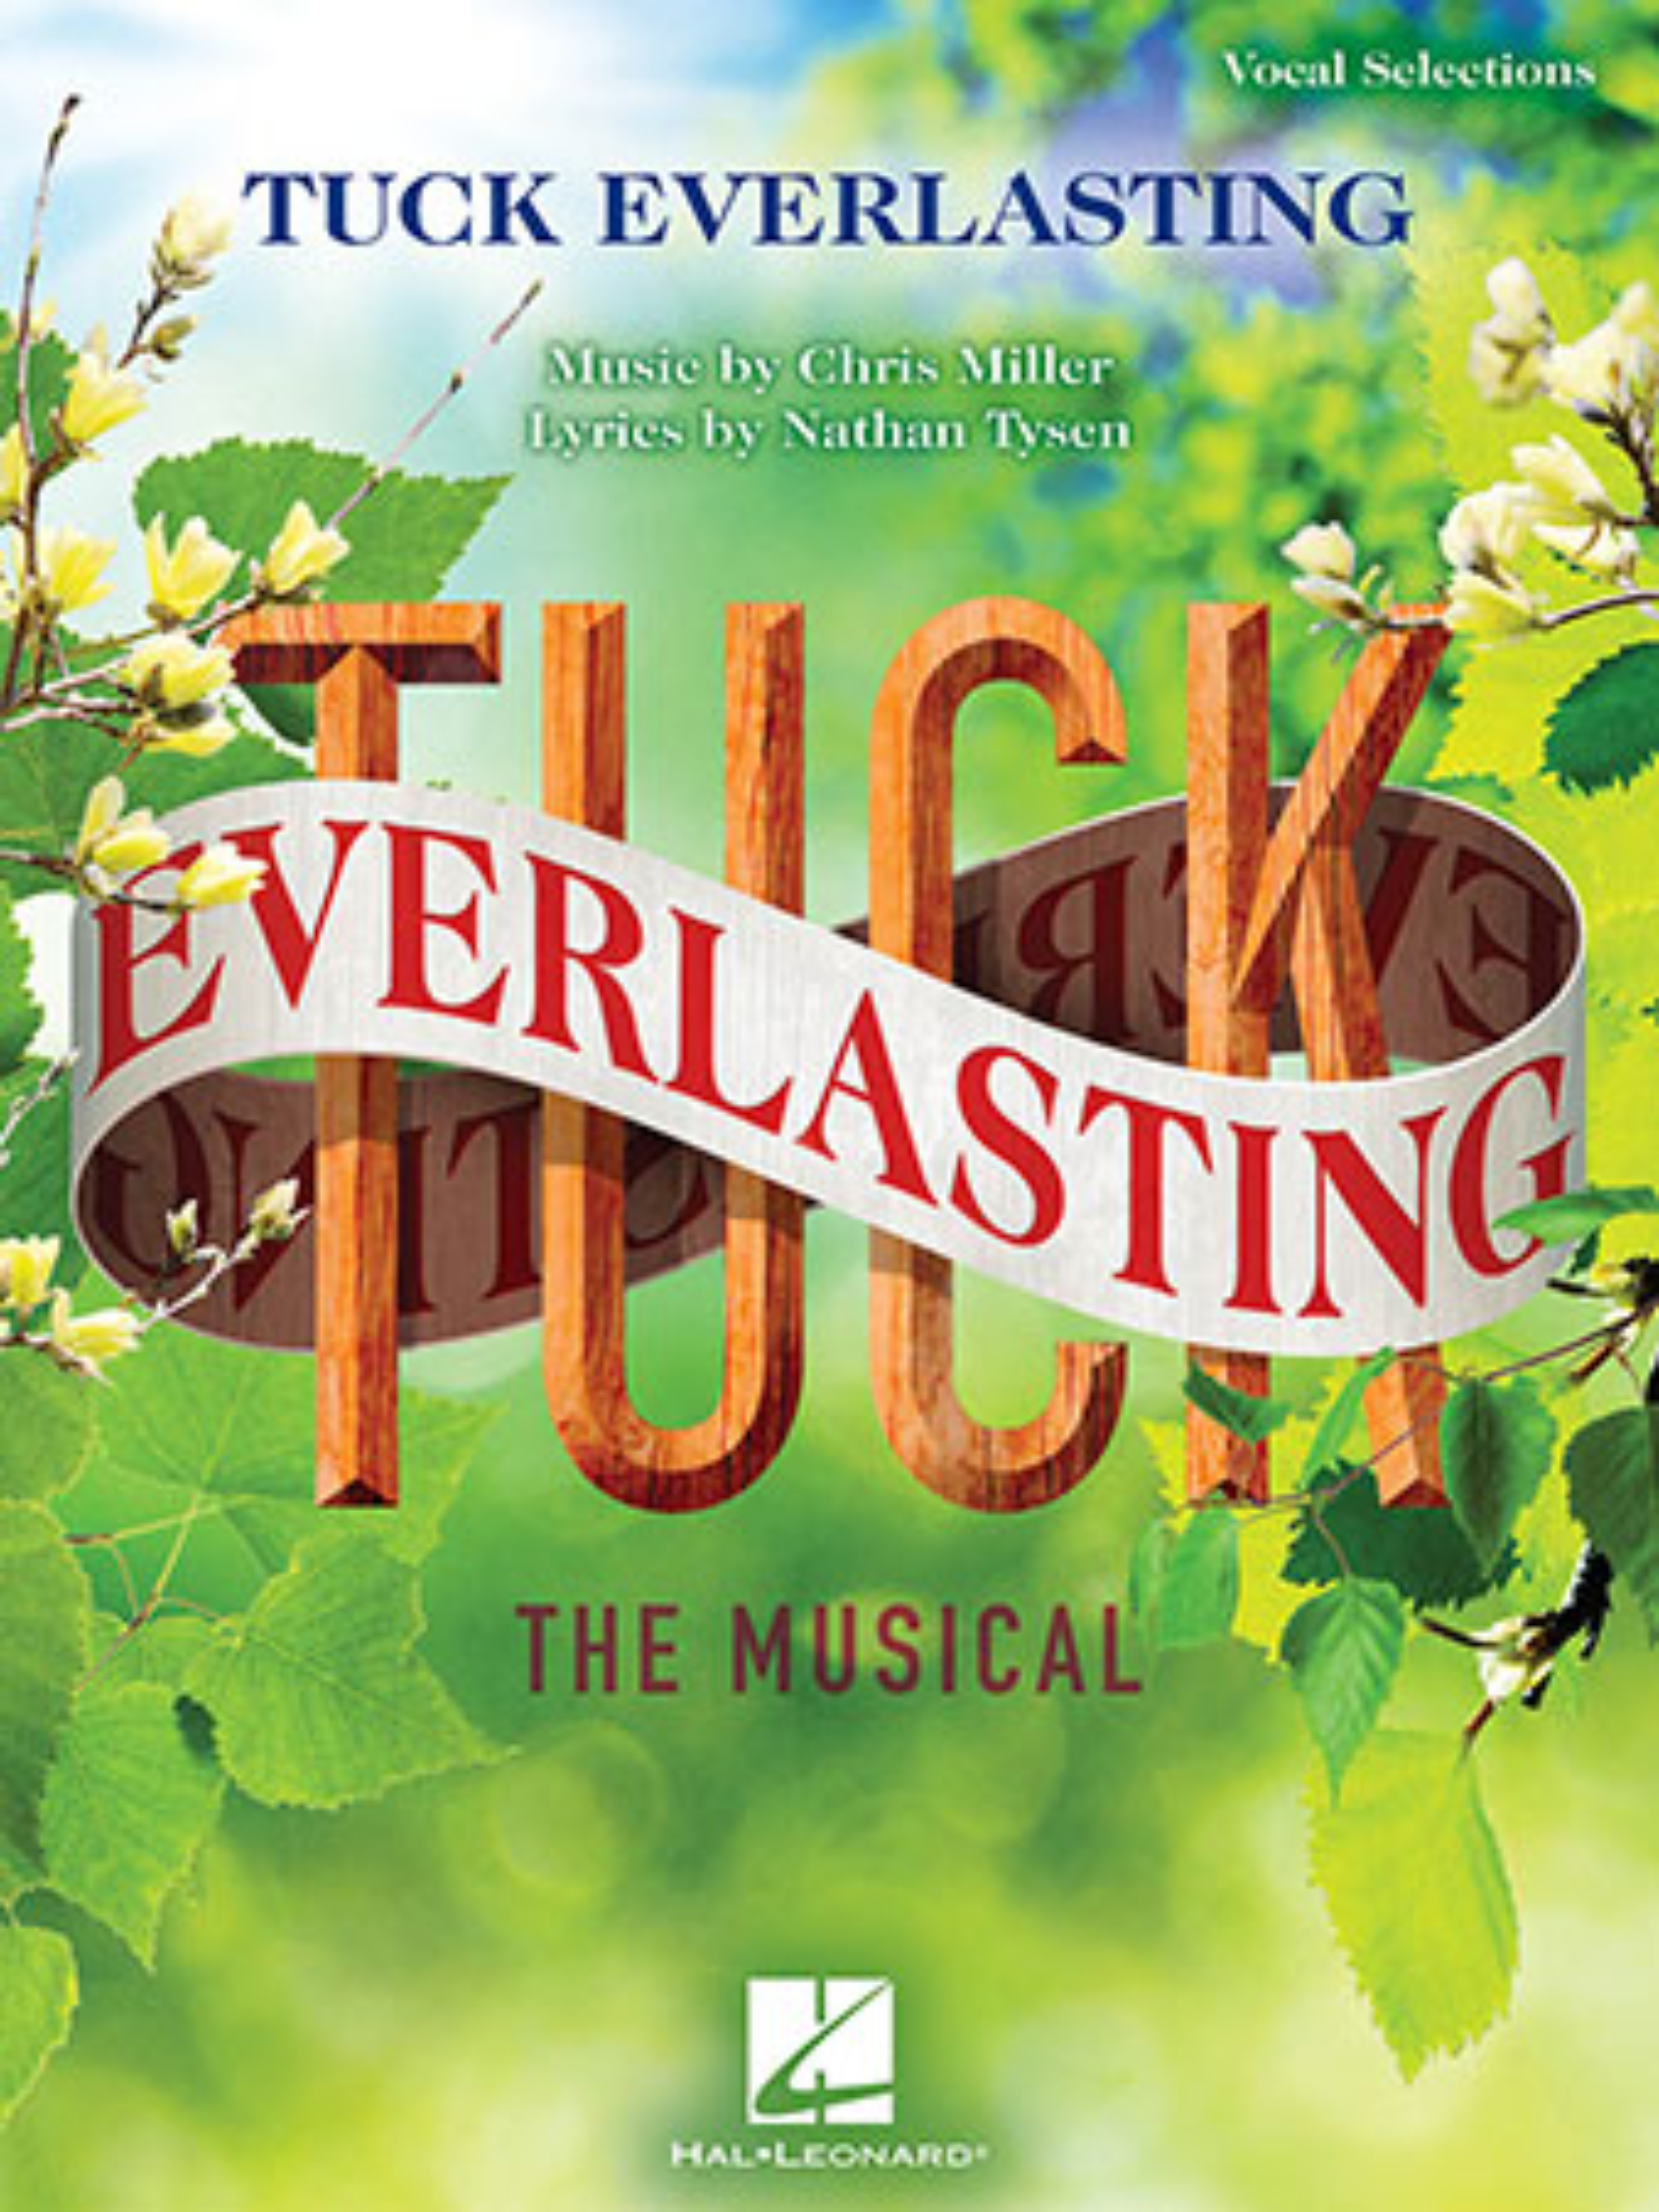 Tuck Everlasting: The Musical